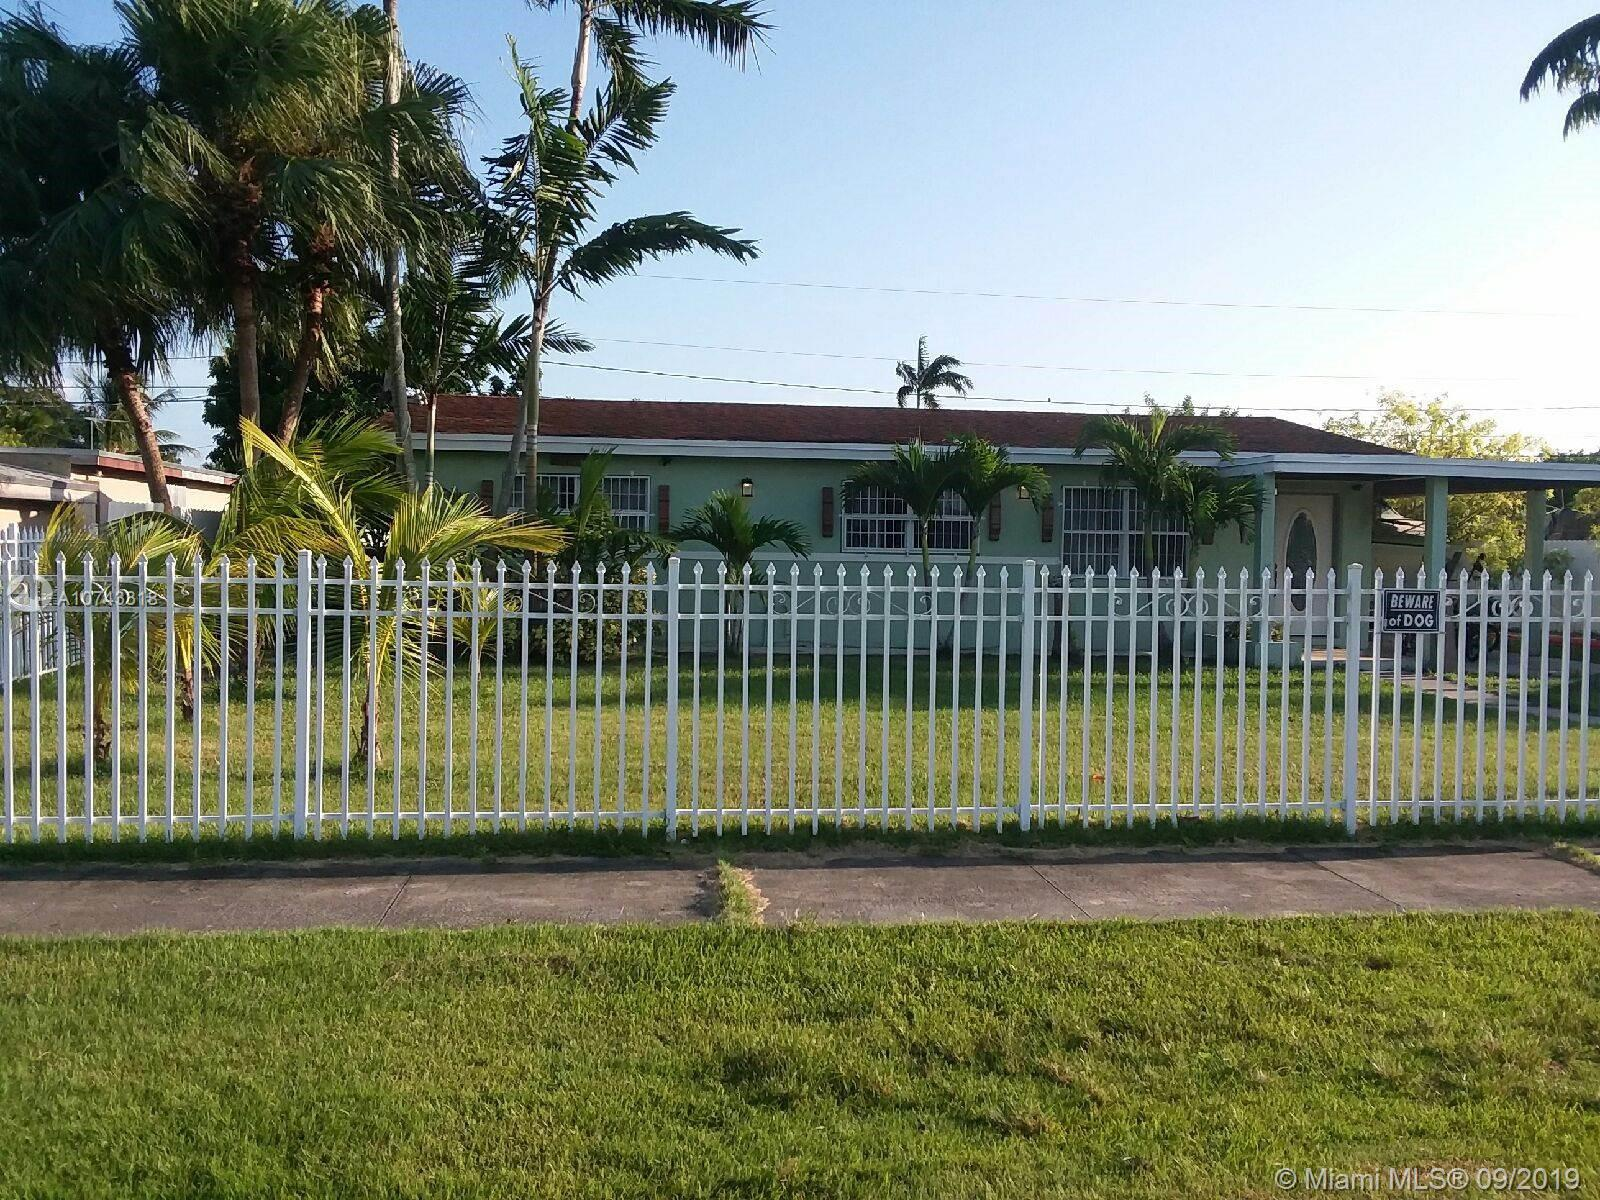 14750 SW 301st St, Homestead, FL 33033 - Homestead, FL real estate listing